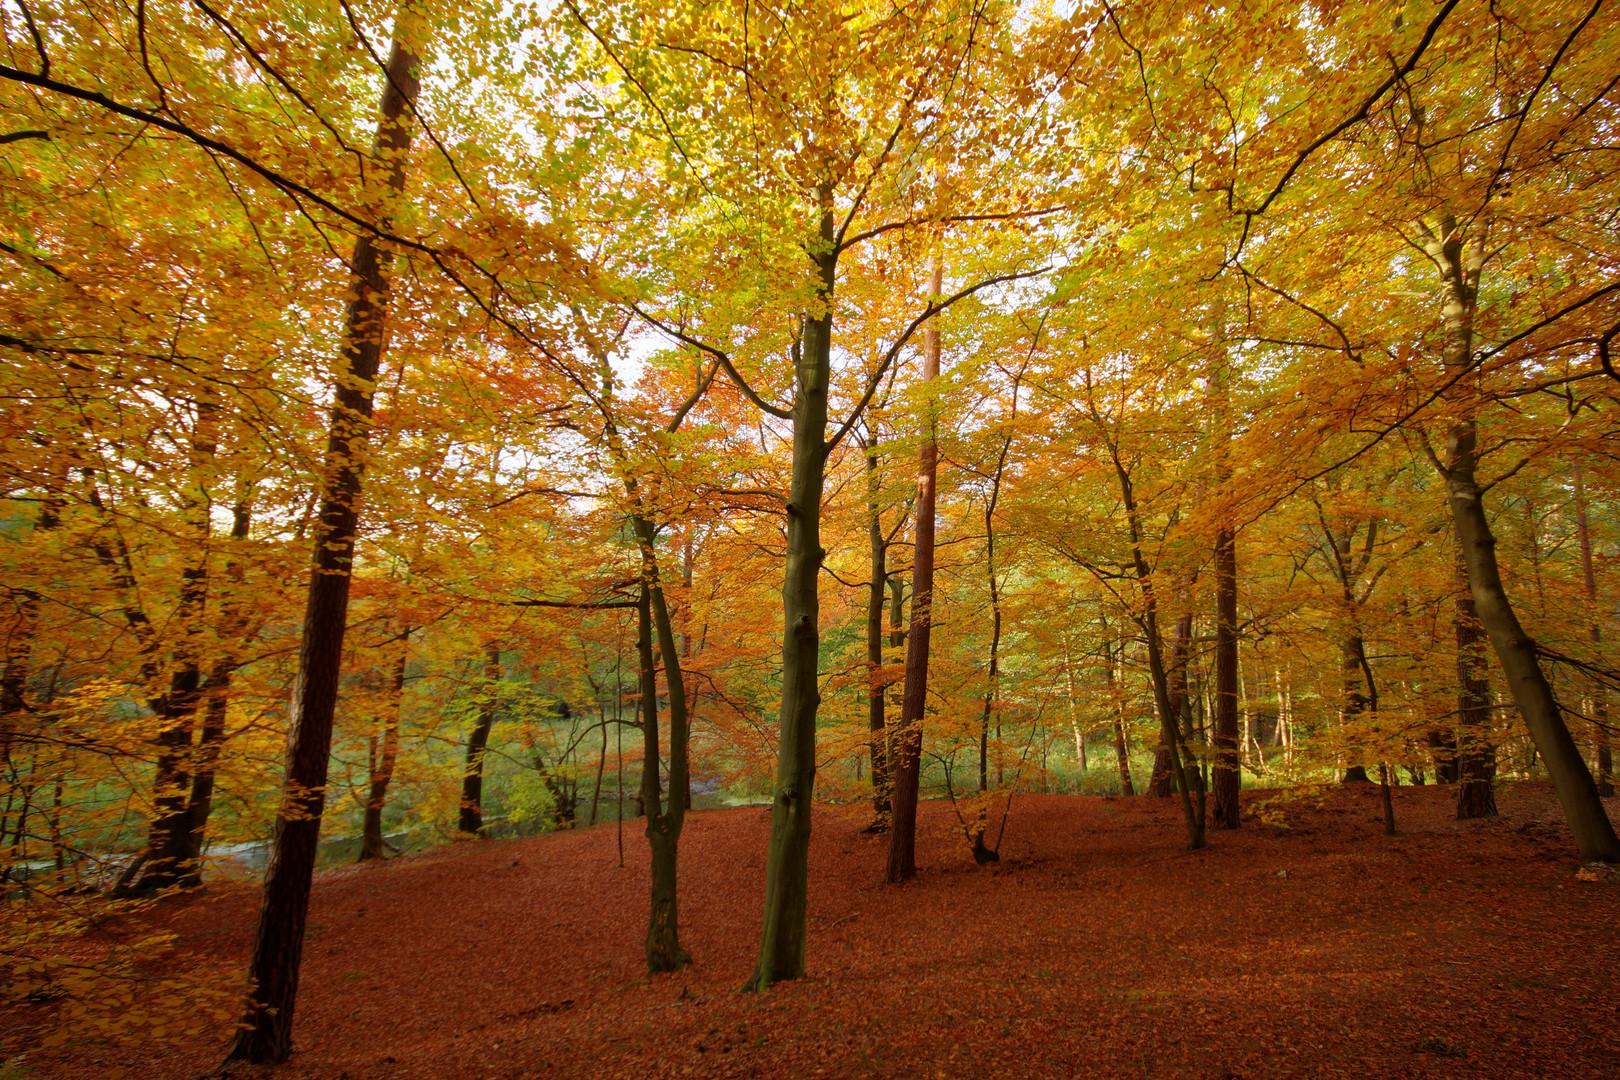 Herbst ist da